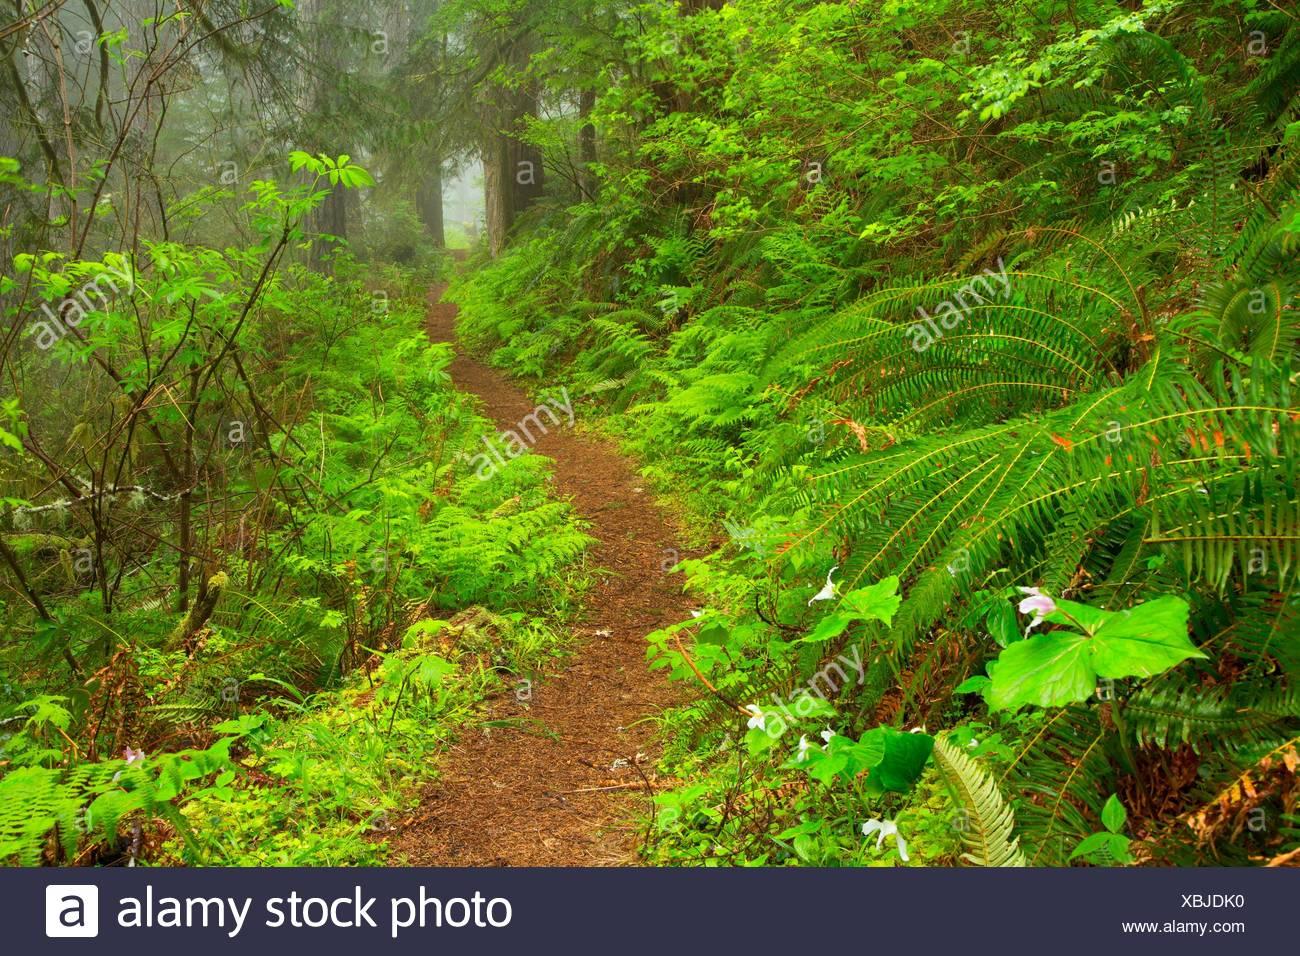 Harris Ranch Trail, Drift Creek Wilderness, Siuslaw National Forest, Oregon. - Stock Image